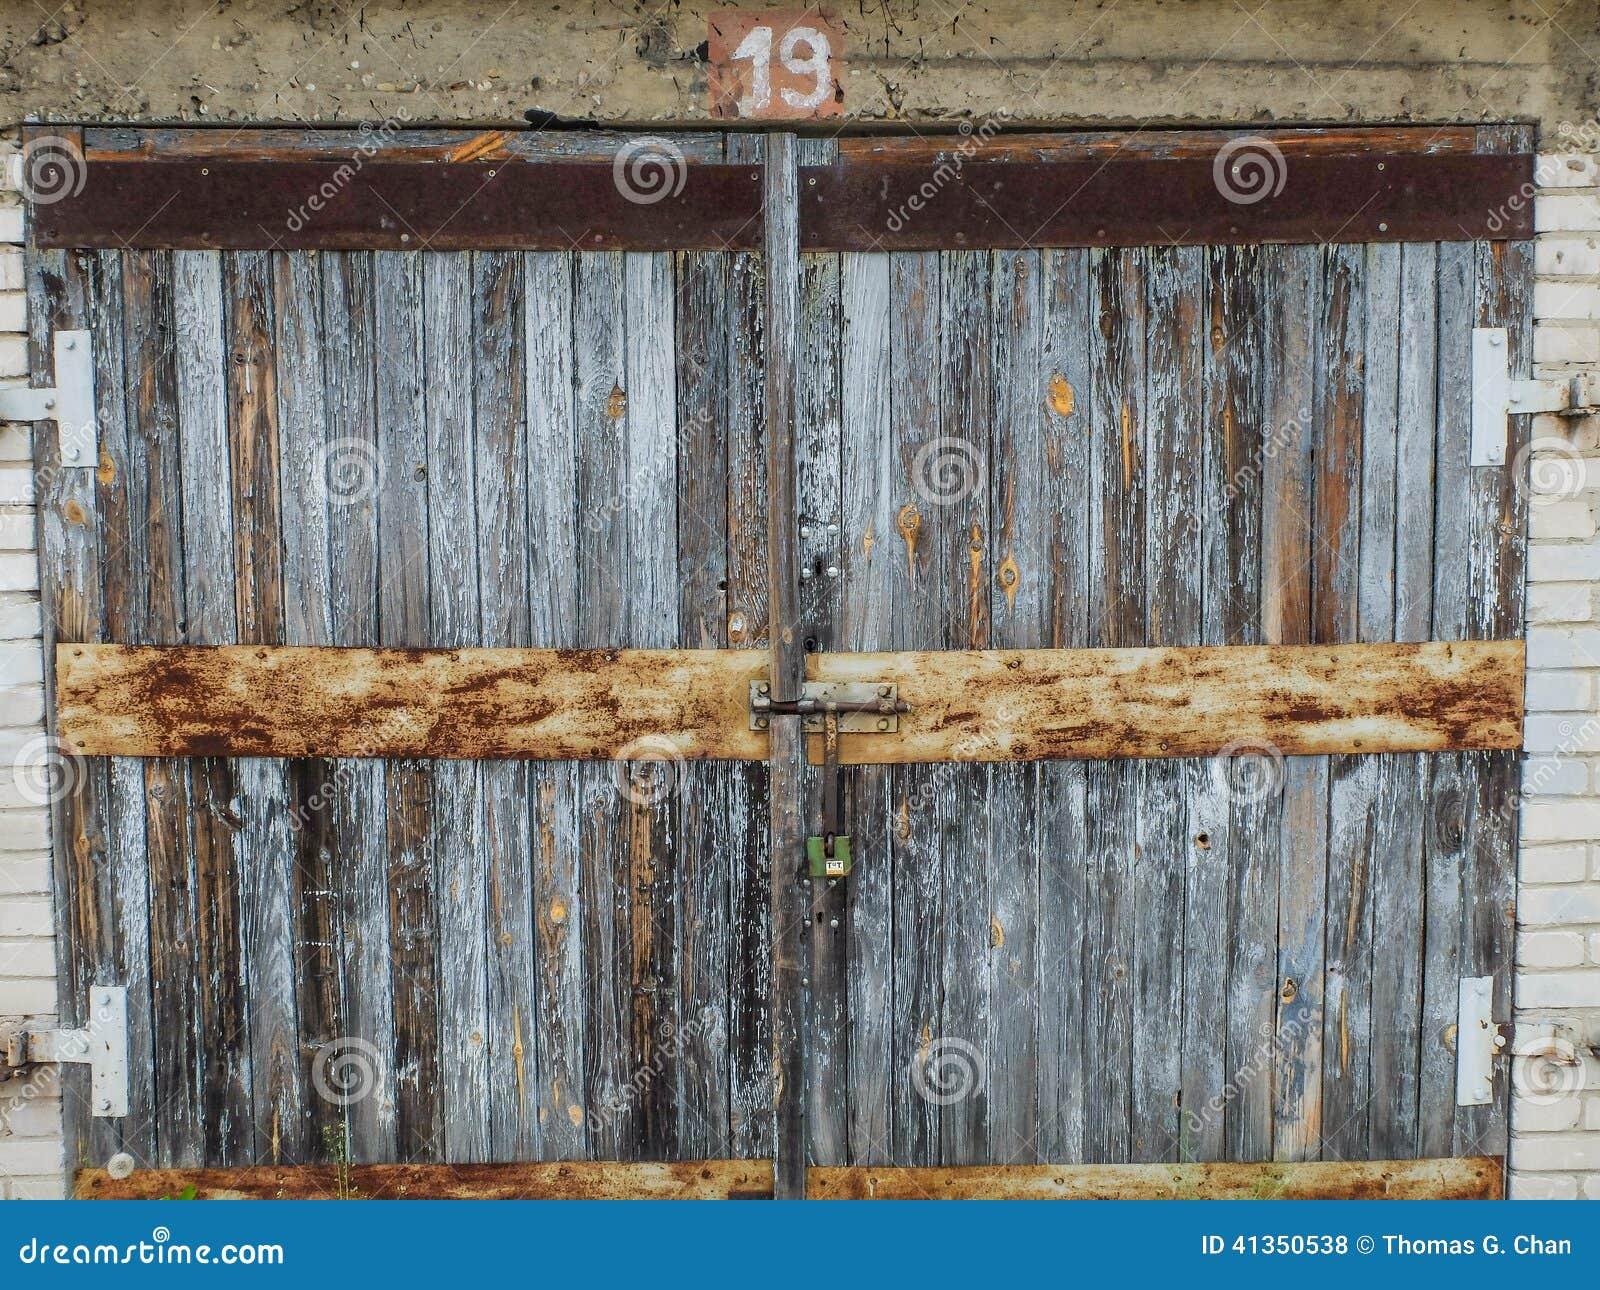 Une vieille porte en bois de garage photo stock image 41350538 - Vieille porte en bois ...